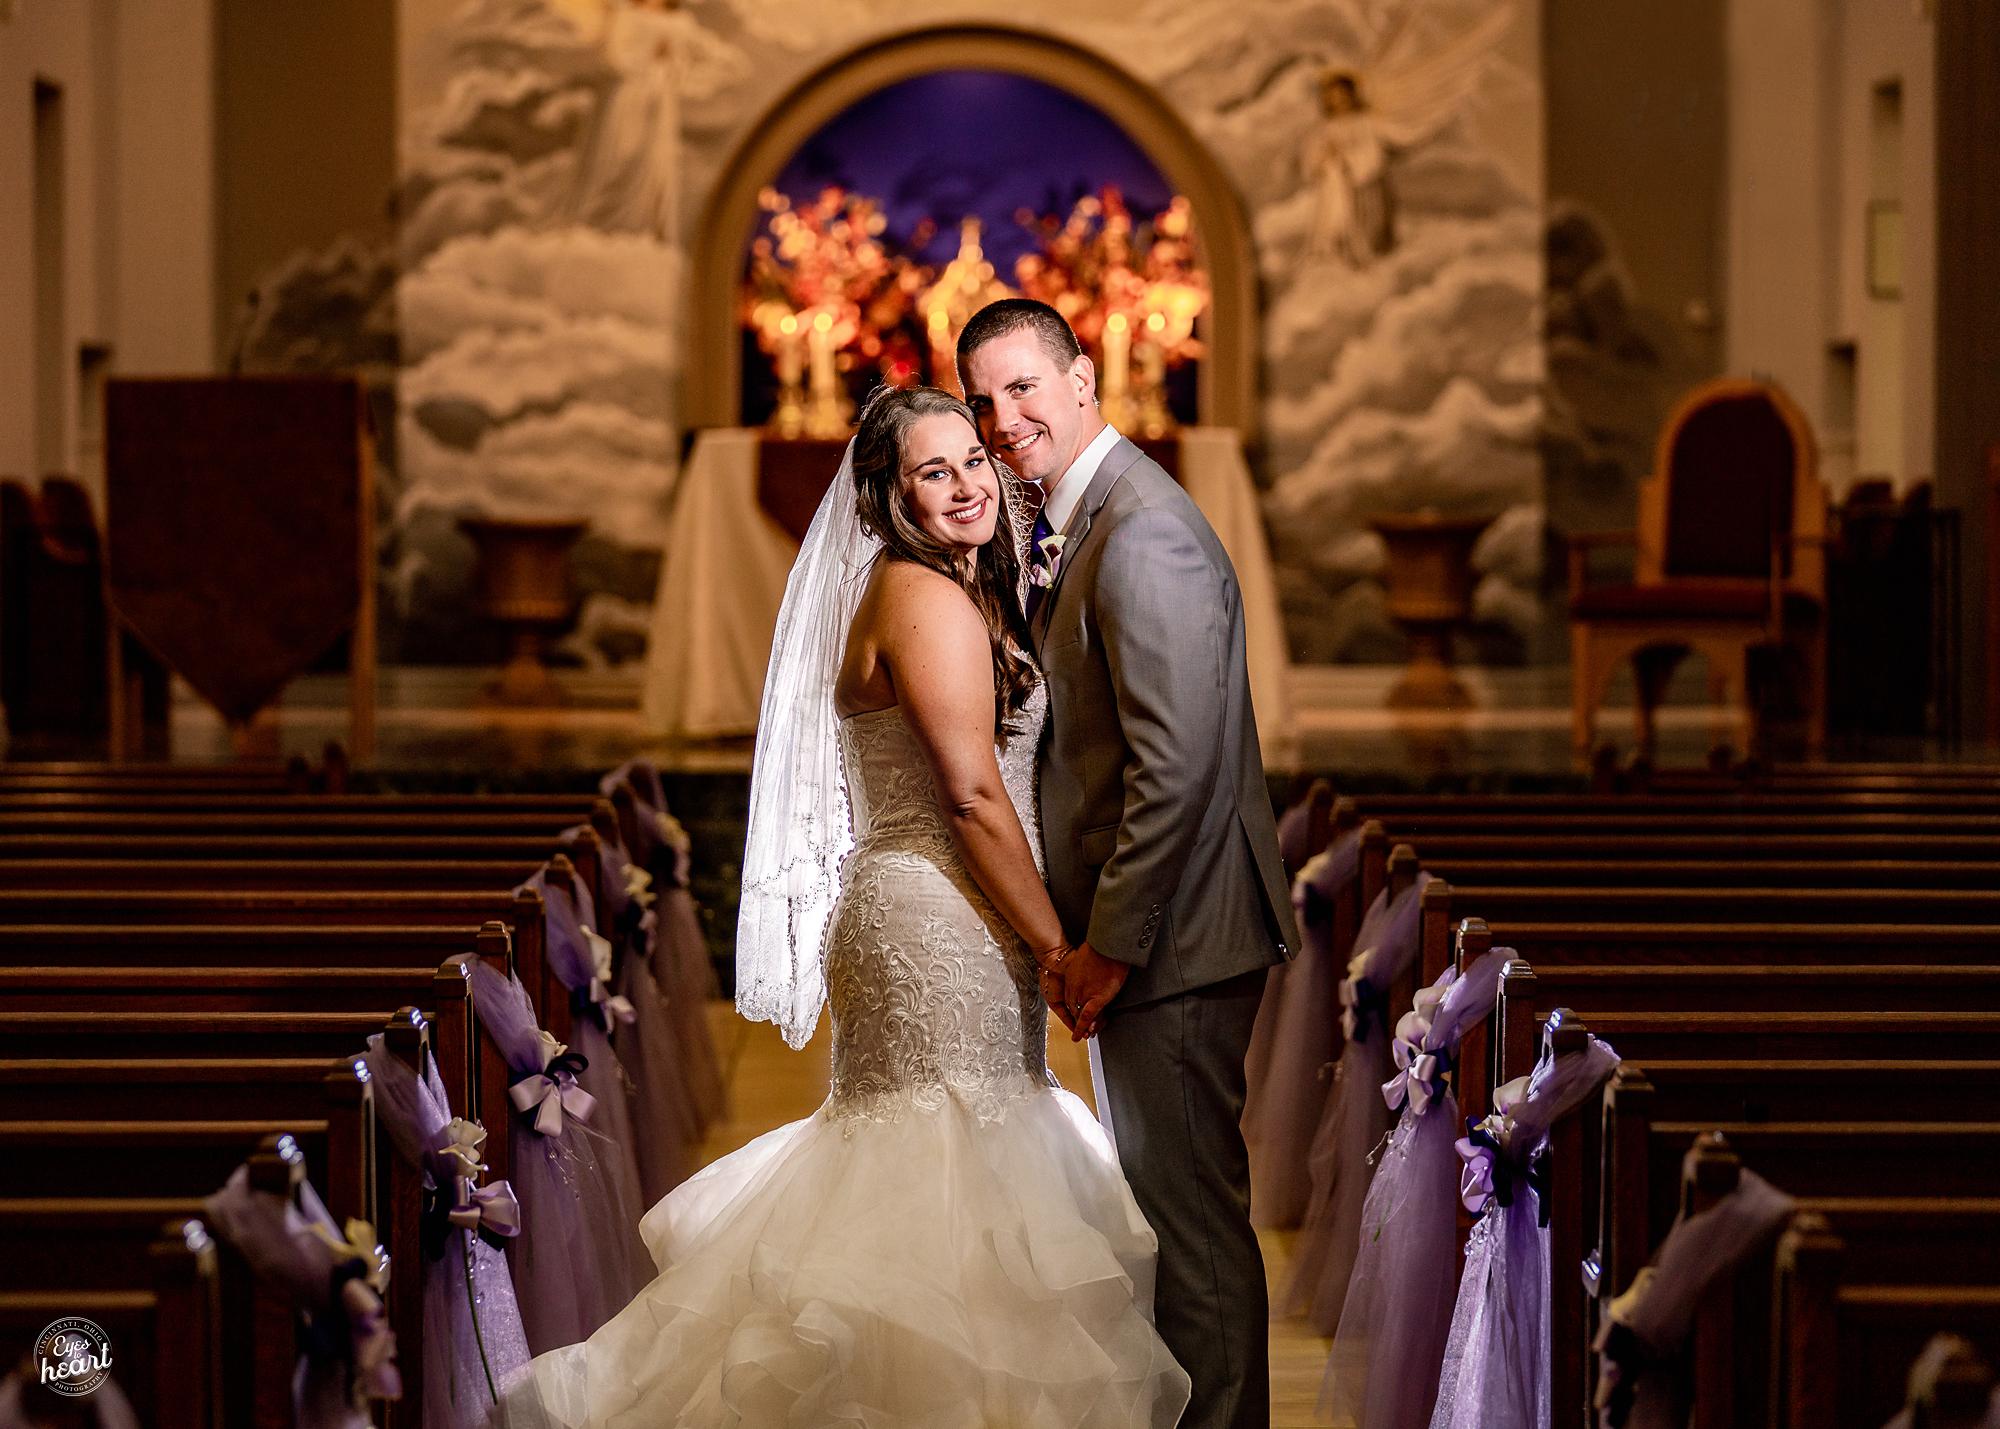 St-Henry-Catholic-Church-Erlanger-KY-Wedding-Photography-7.jpg